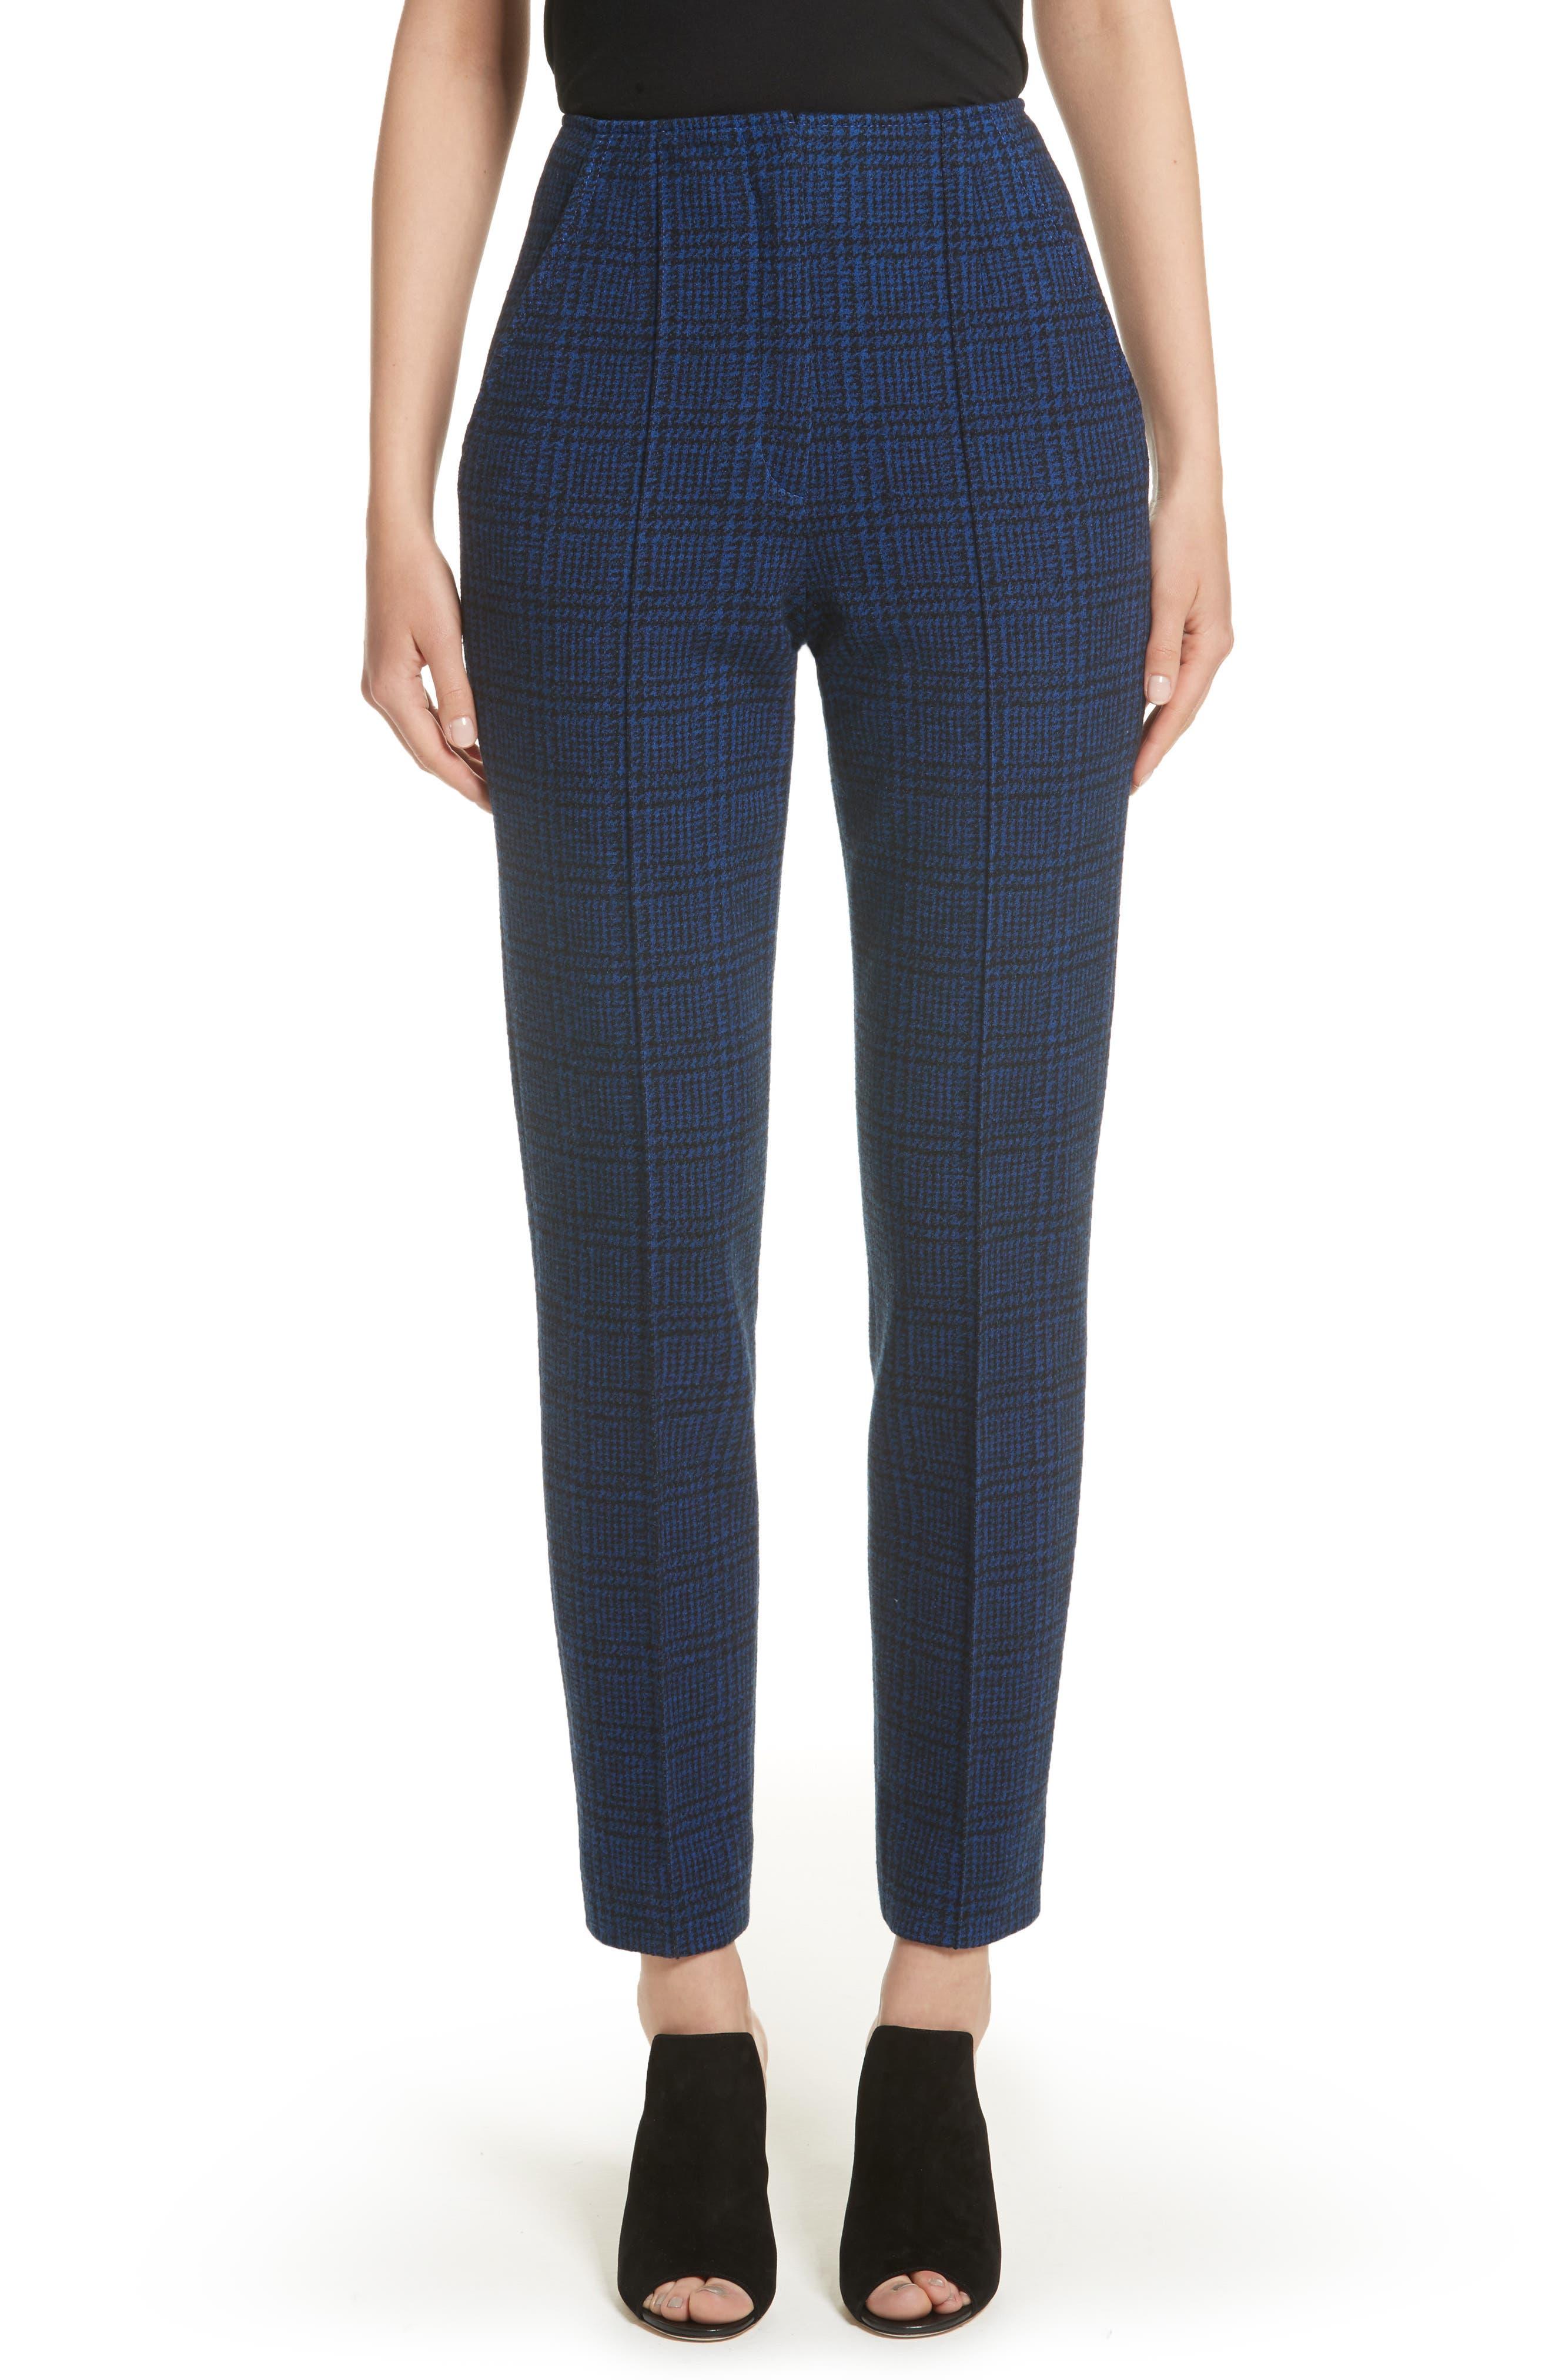 Jason Wu Houndstooth Plaid Wool Slim Pants